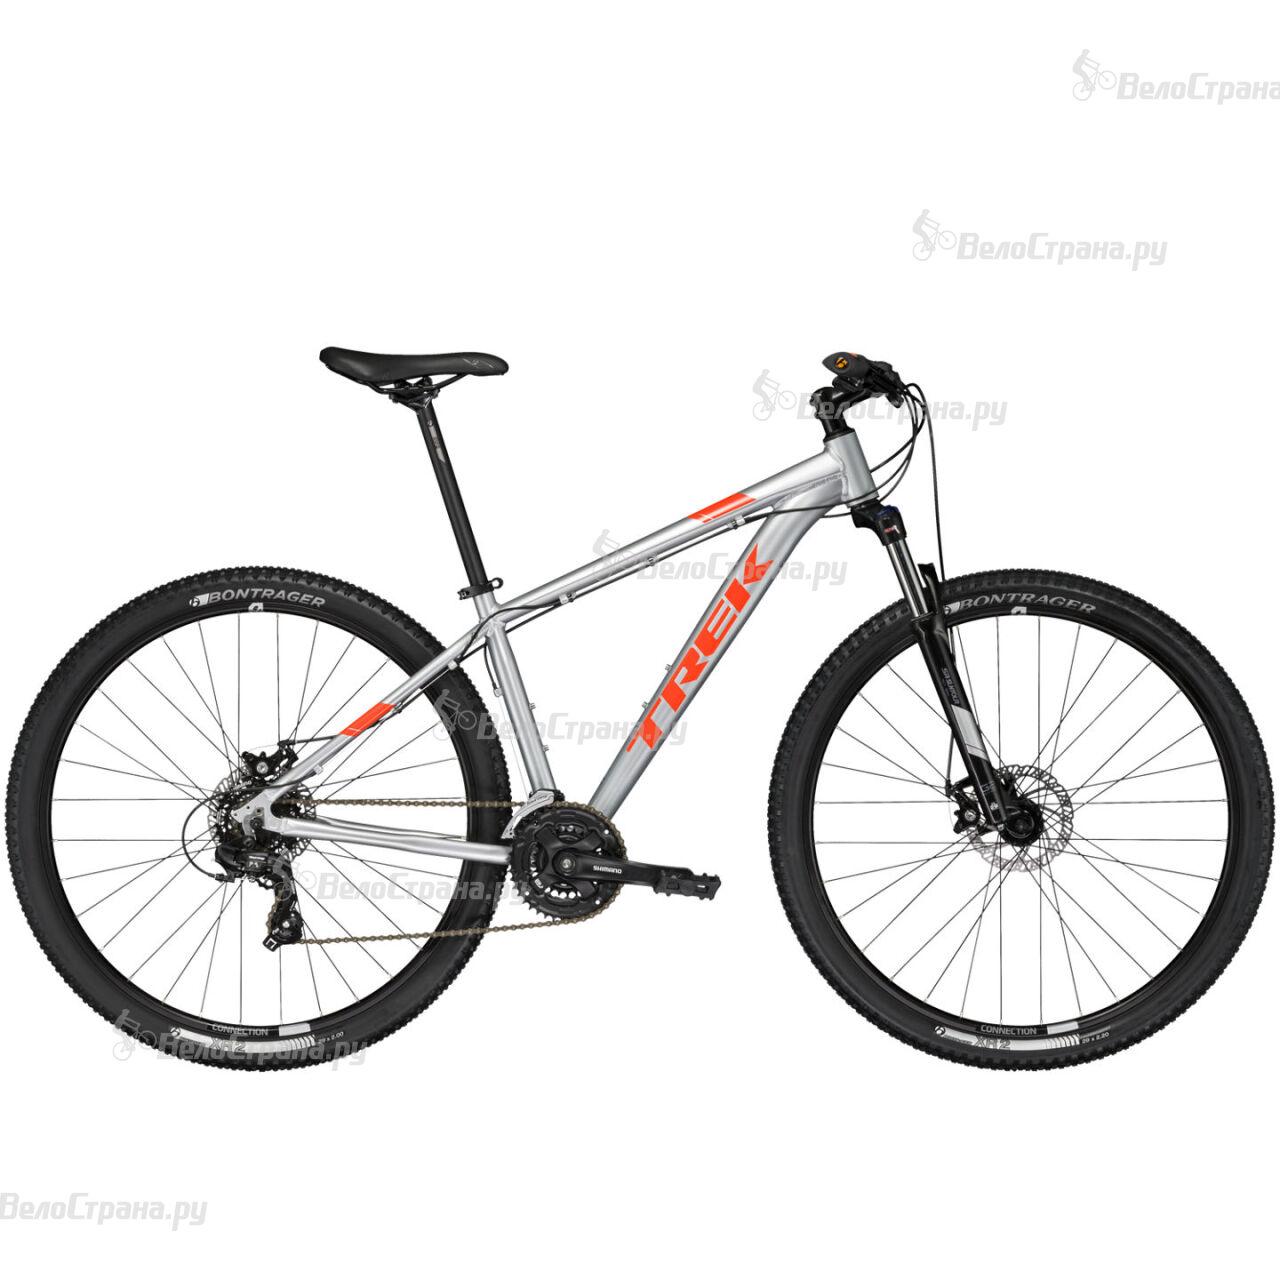 Велосипед Trek Marlin 5 27,5 (2017) велосипед trek marlin 5 29 2018